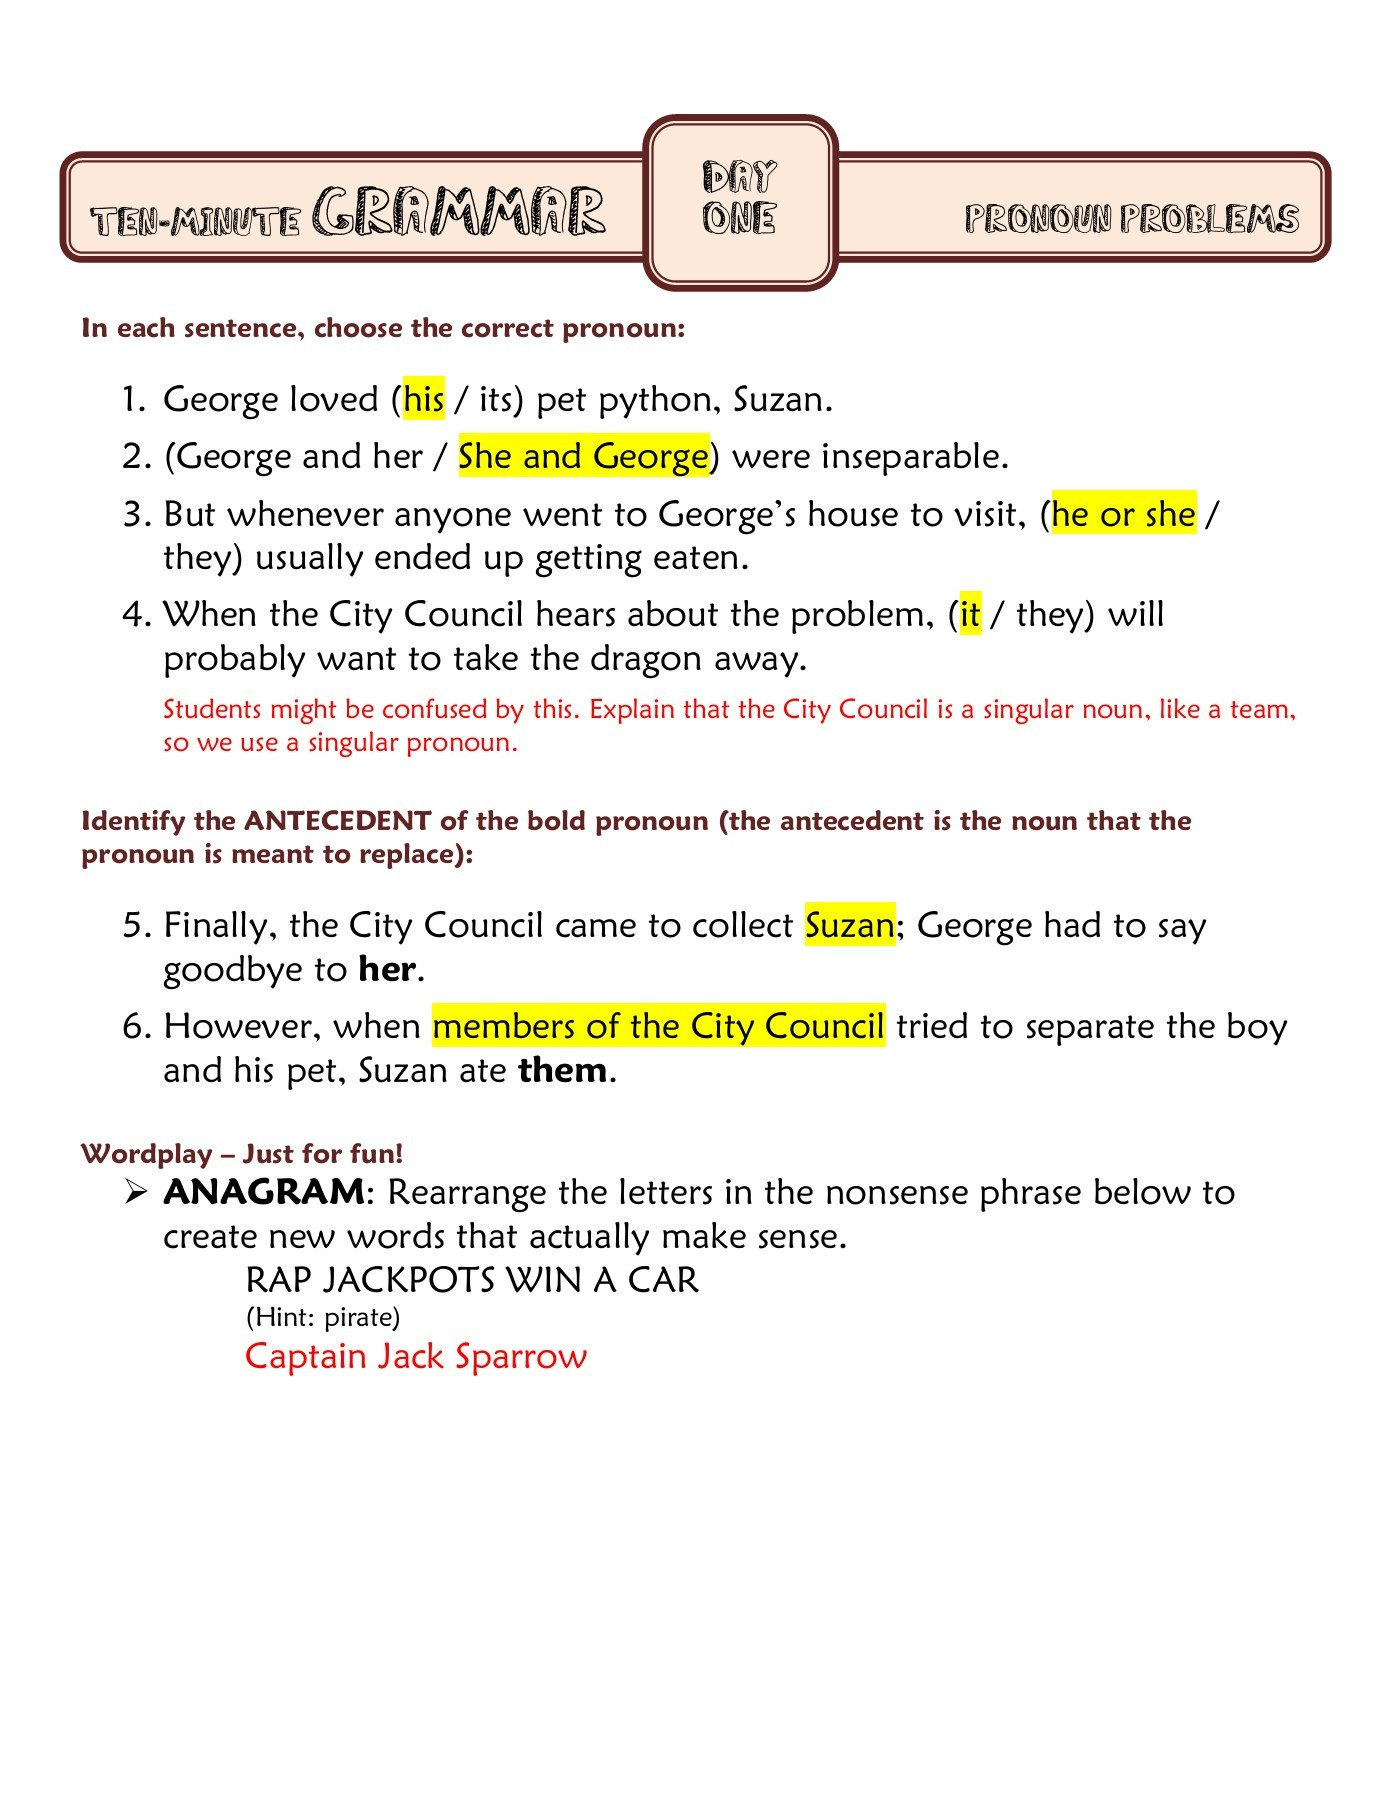 hight resolution of Ten Minute Grammar - myCCSD Pages 1 - 16 - Flip PDF Download   FlipHTML5